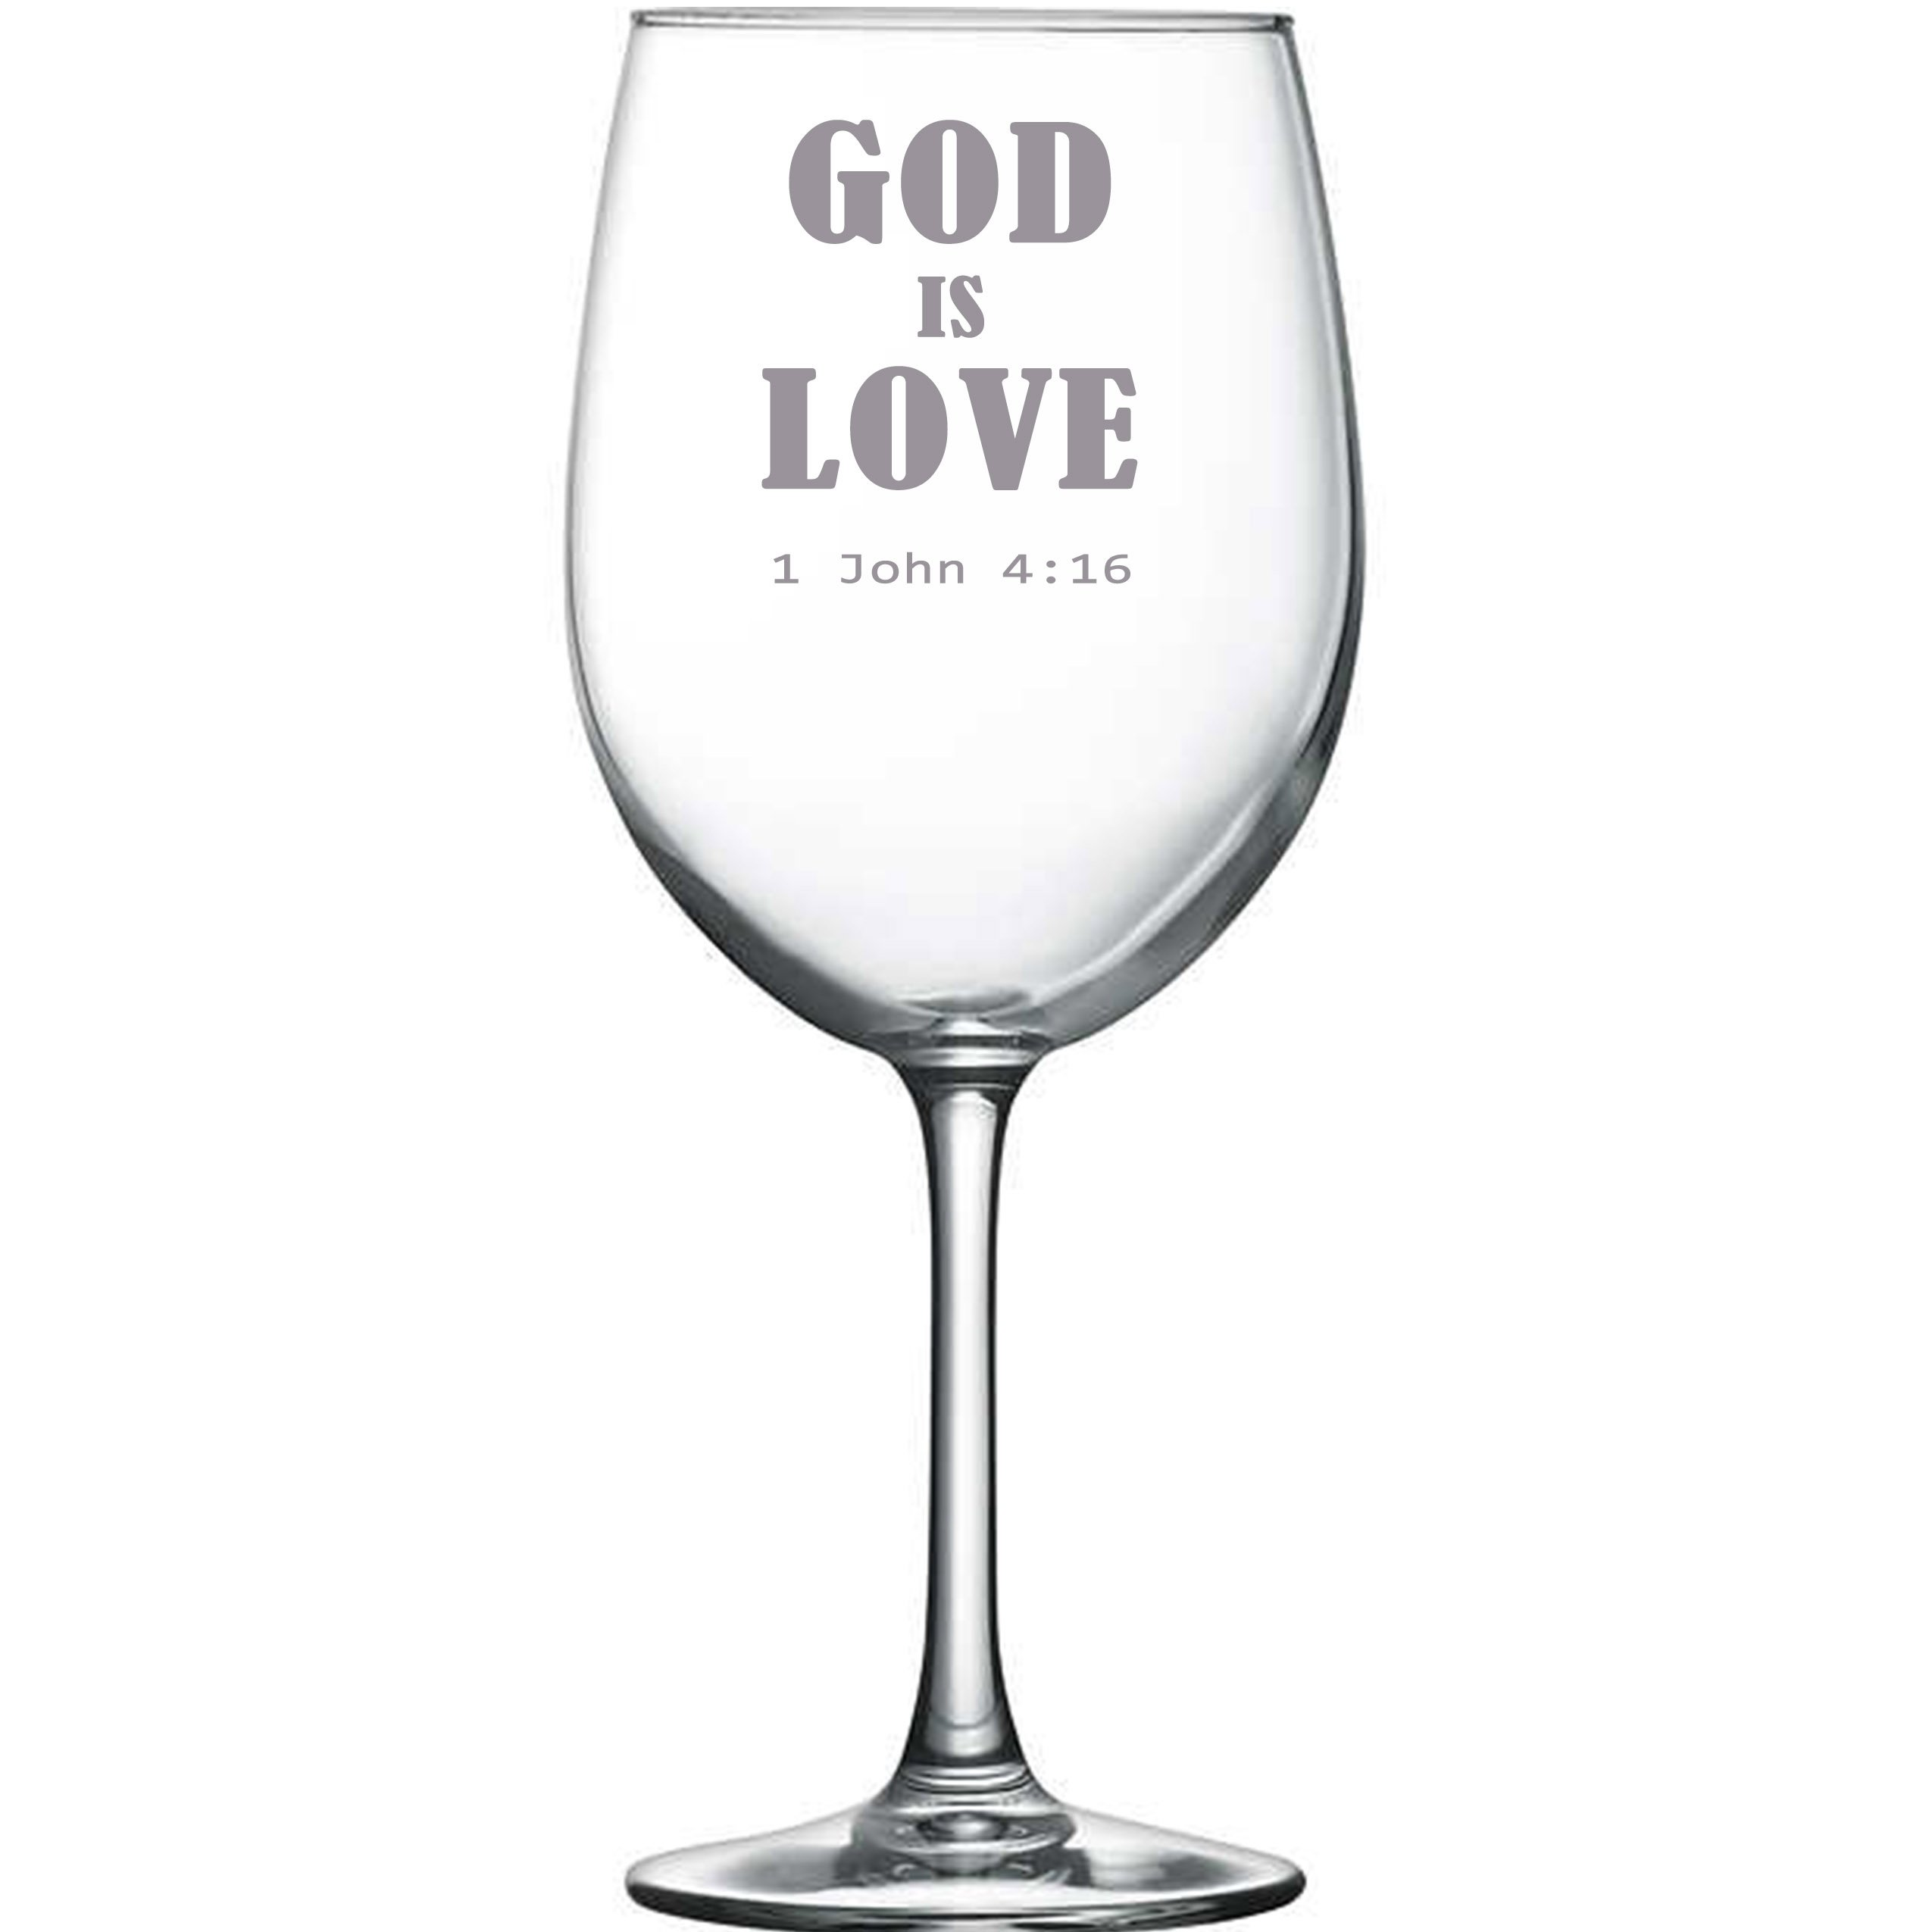 G211 God Is Love christian jesus church catholic religion christ 10.5 oz clear wine glass christmas gift present